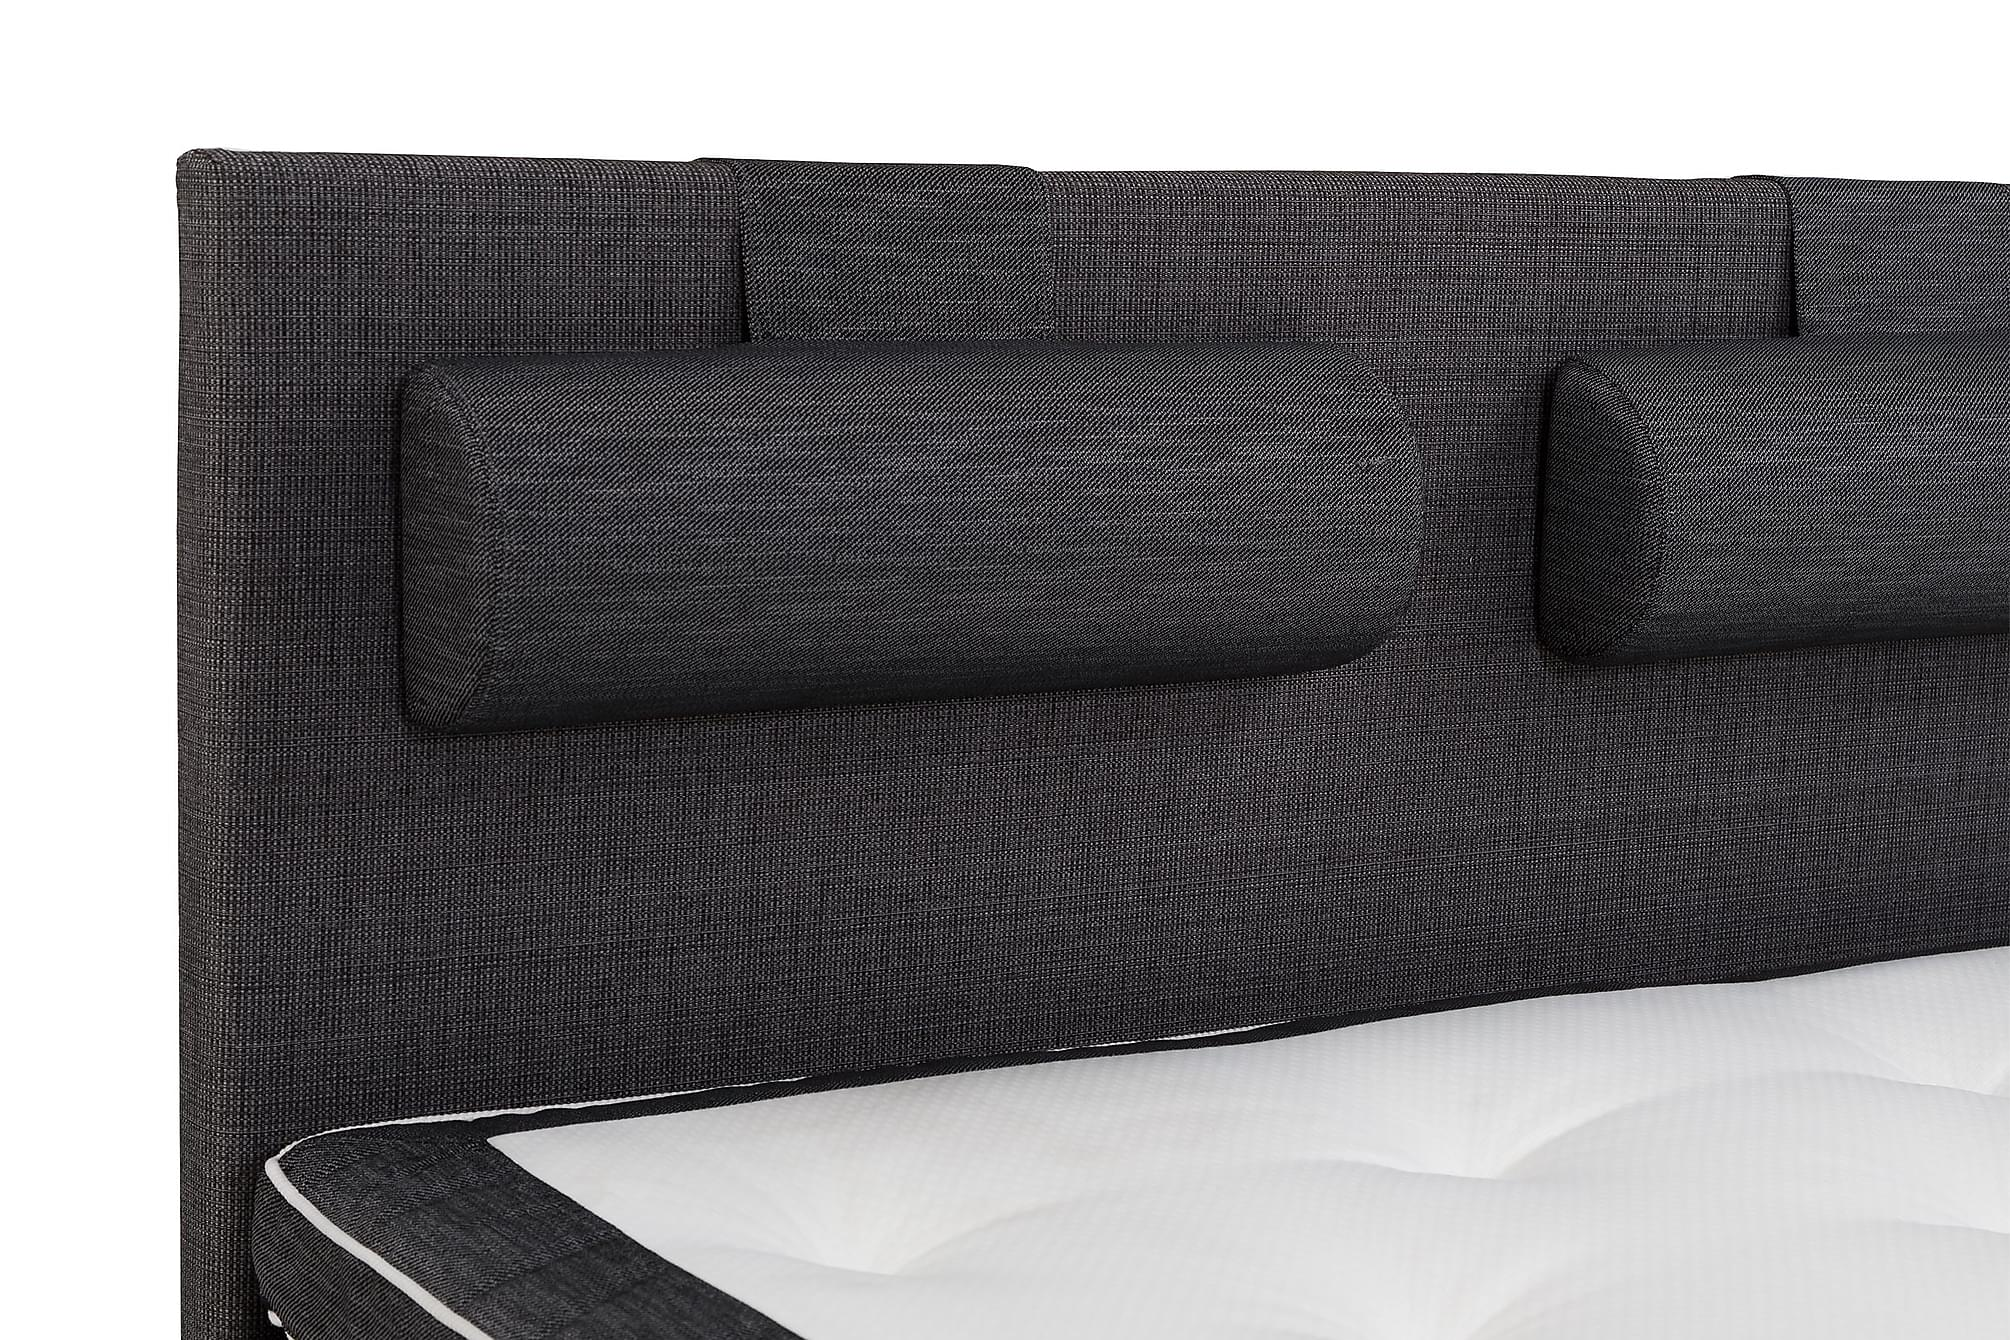 LUX Stor Nackkudde Ancona grå 2-pack – Paketpris